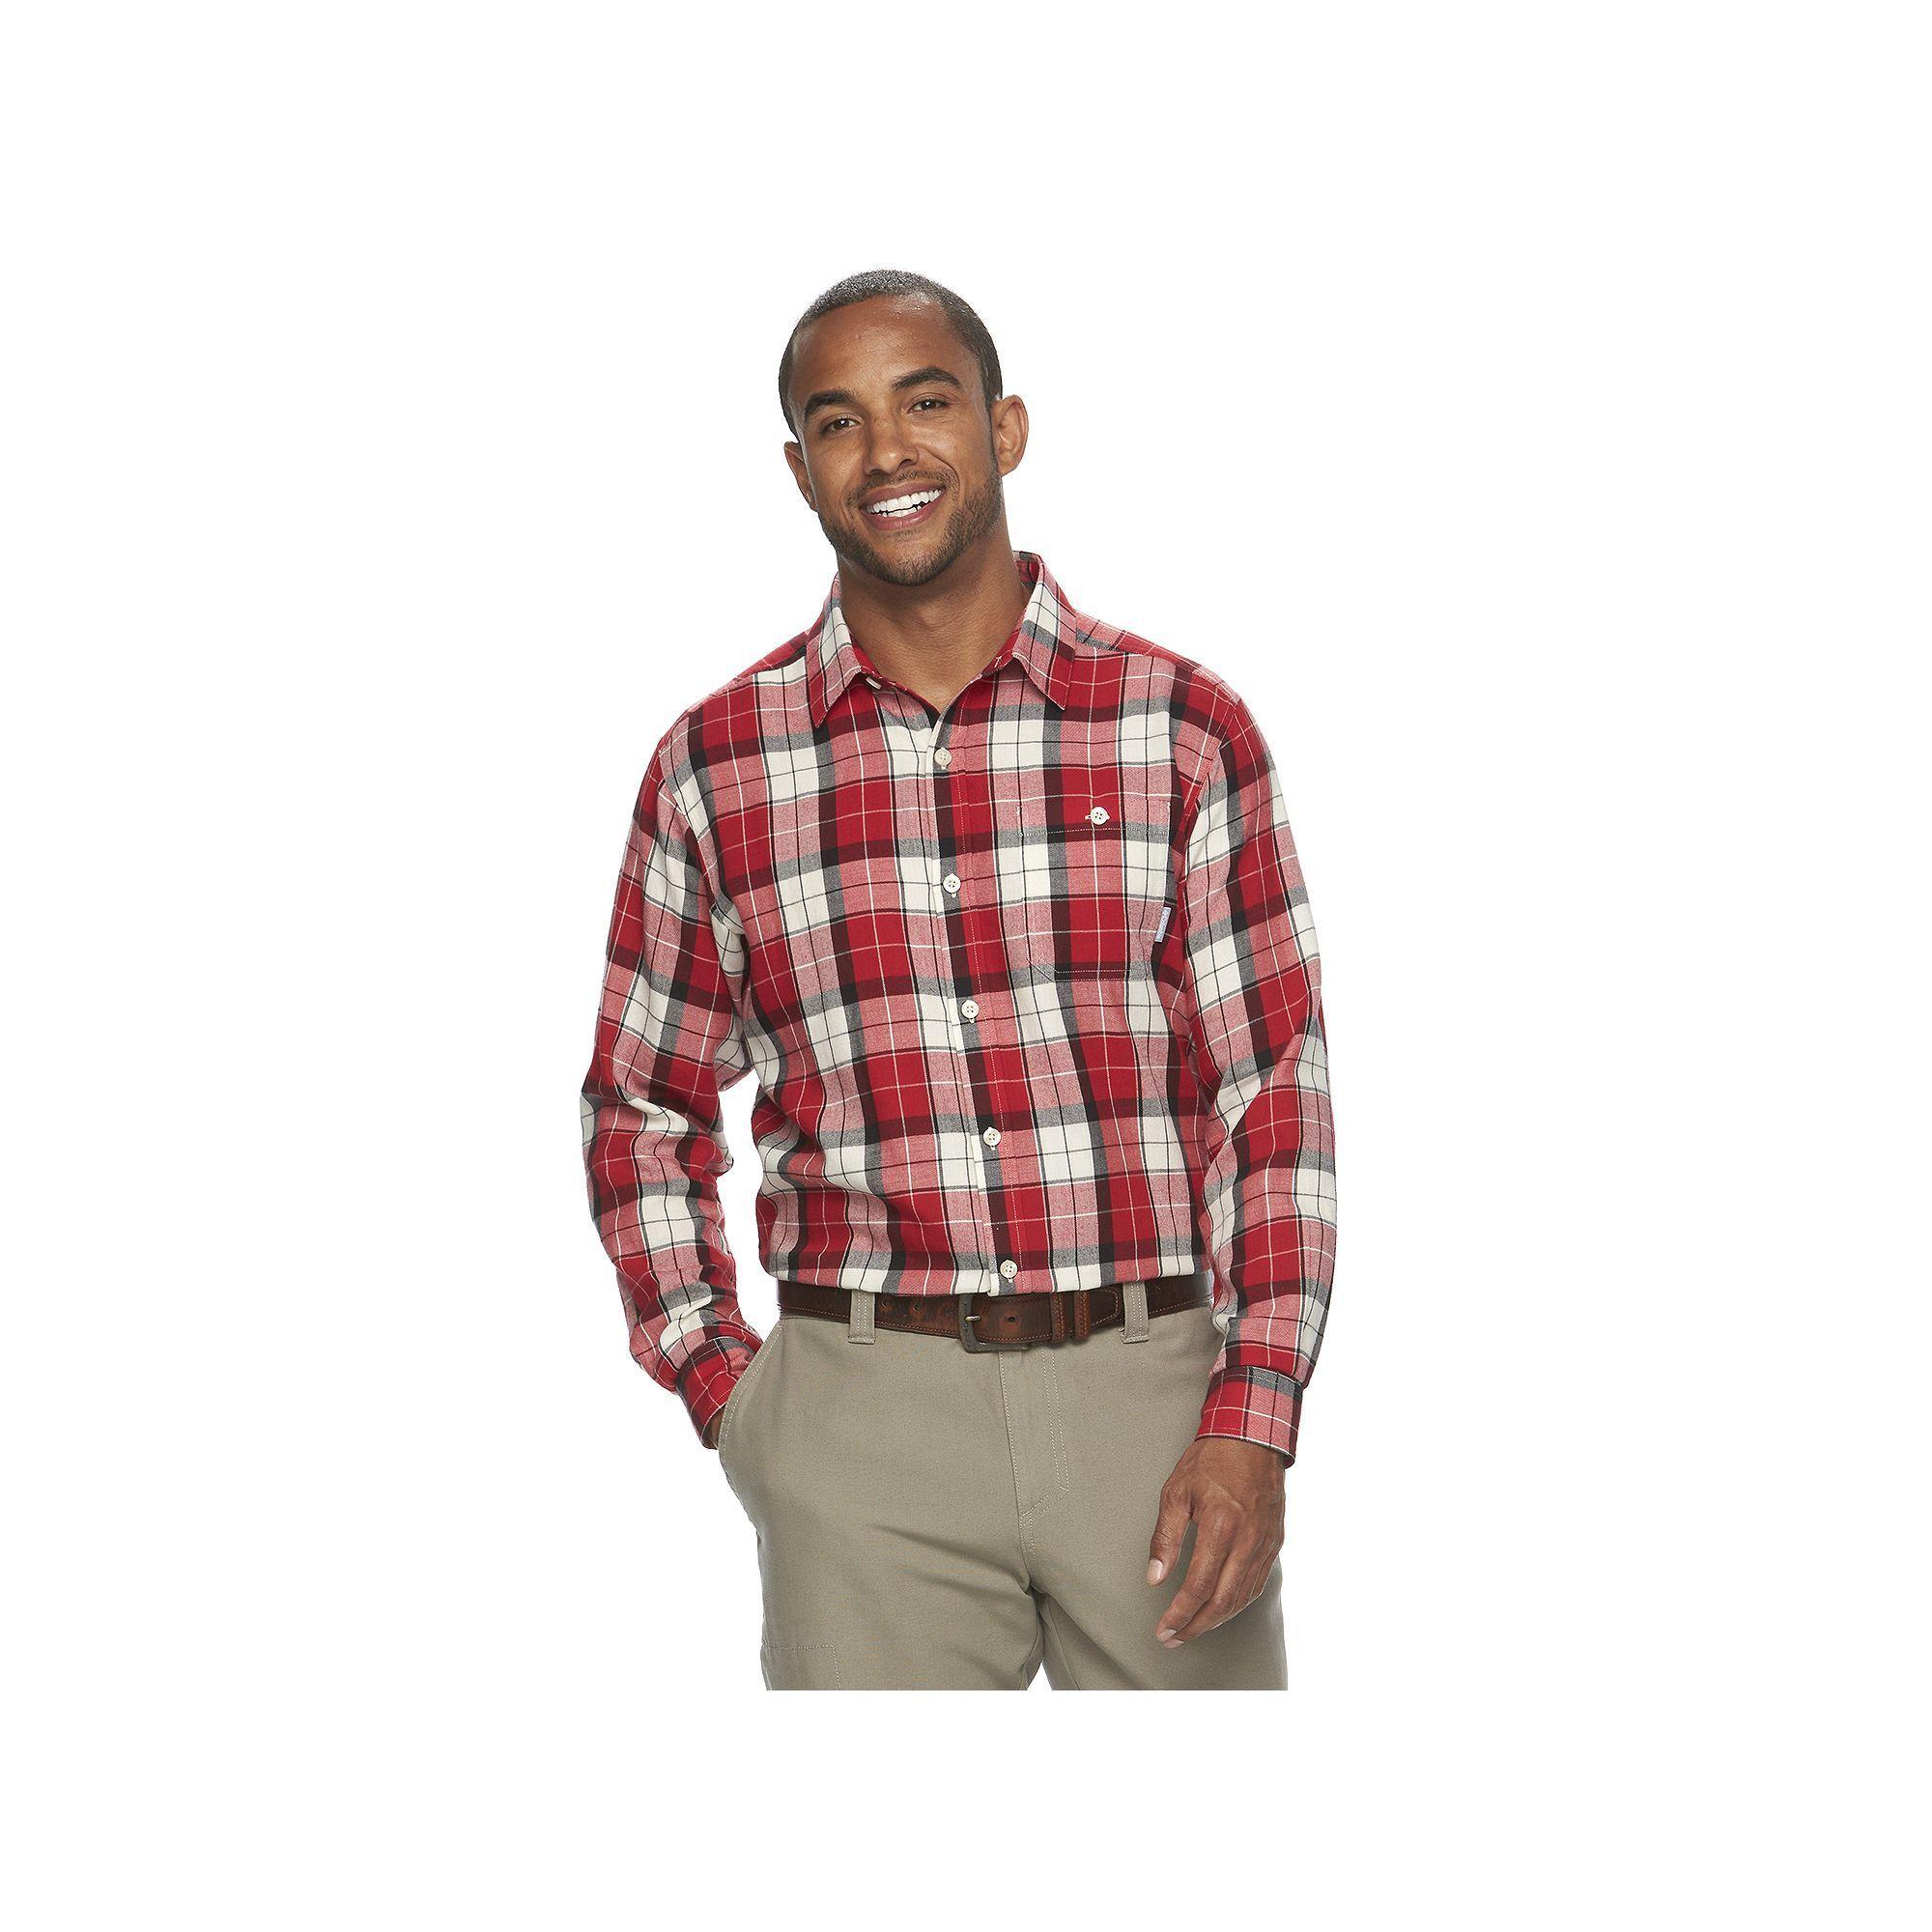 Flannel shirt season  Columbia Menus Notched Peak ClassicFit Plaid ButtonDown Flannel